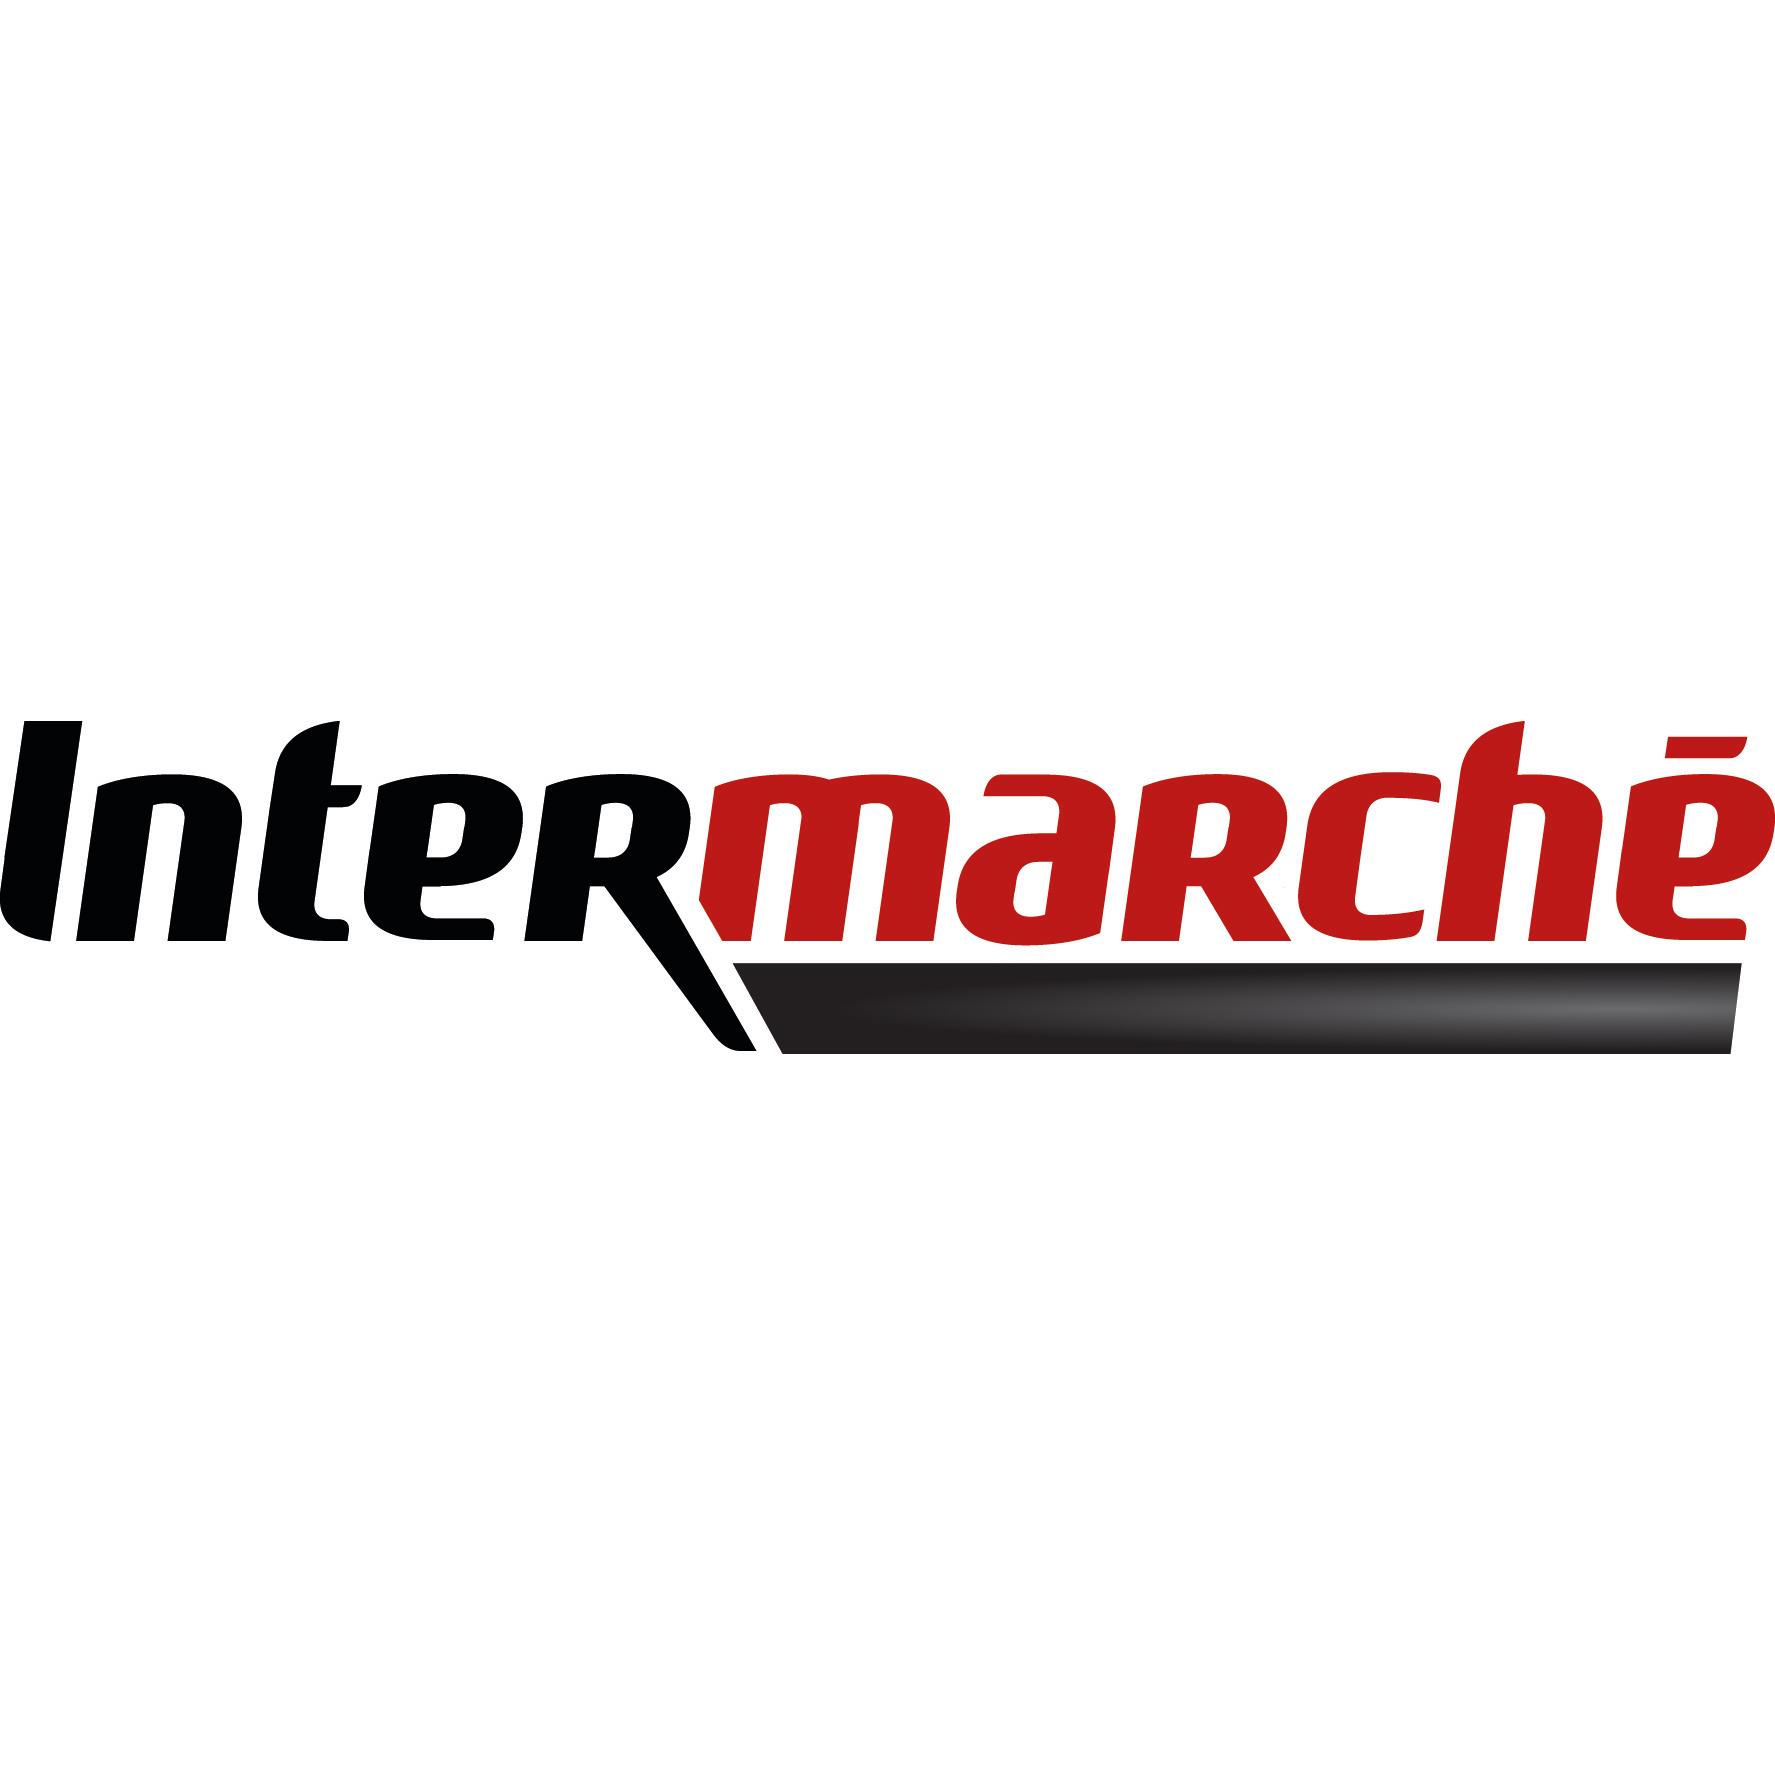 logo-intermarché-imprimerie-burinter-pierrelatte